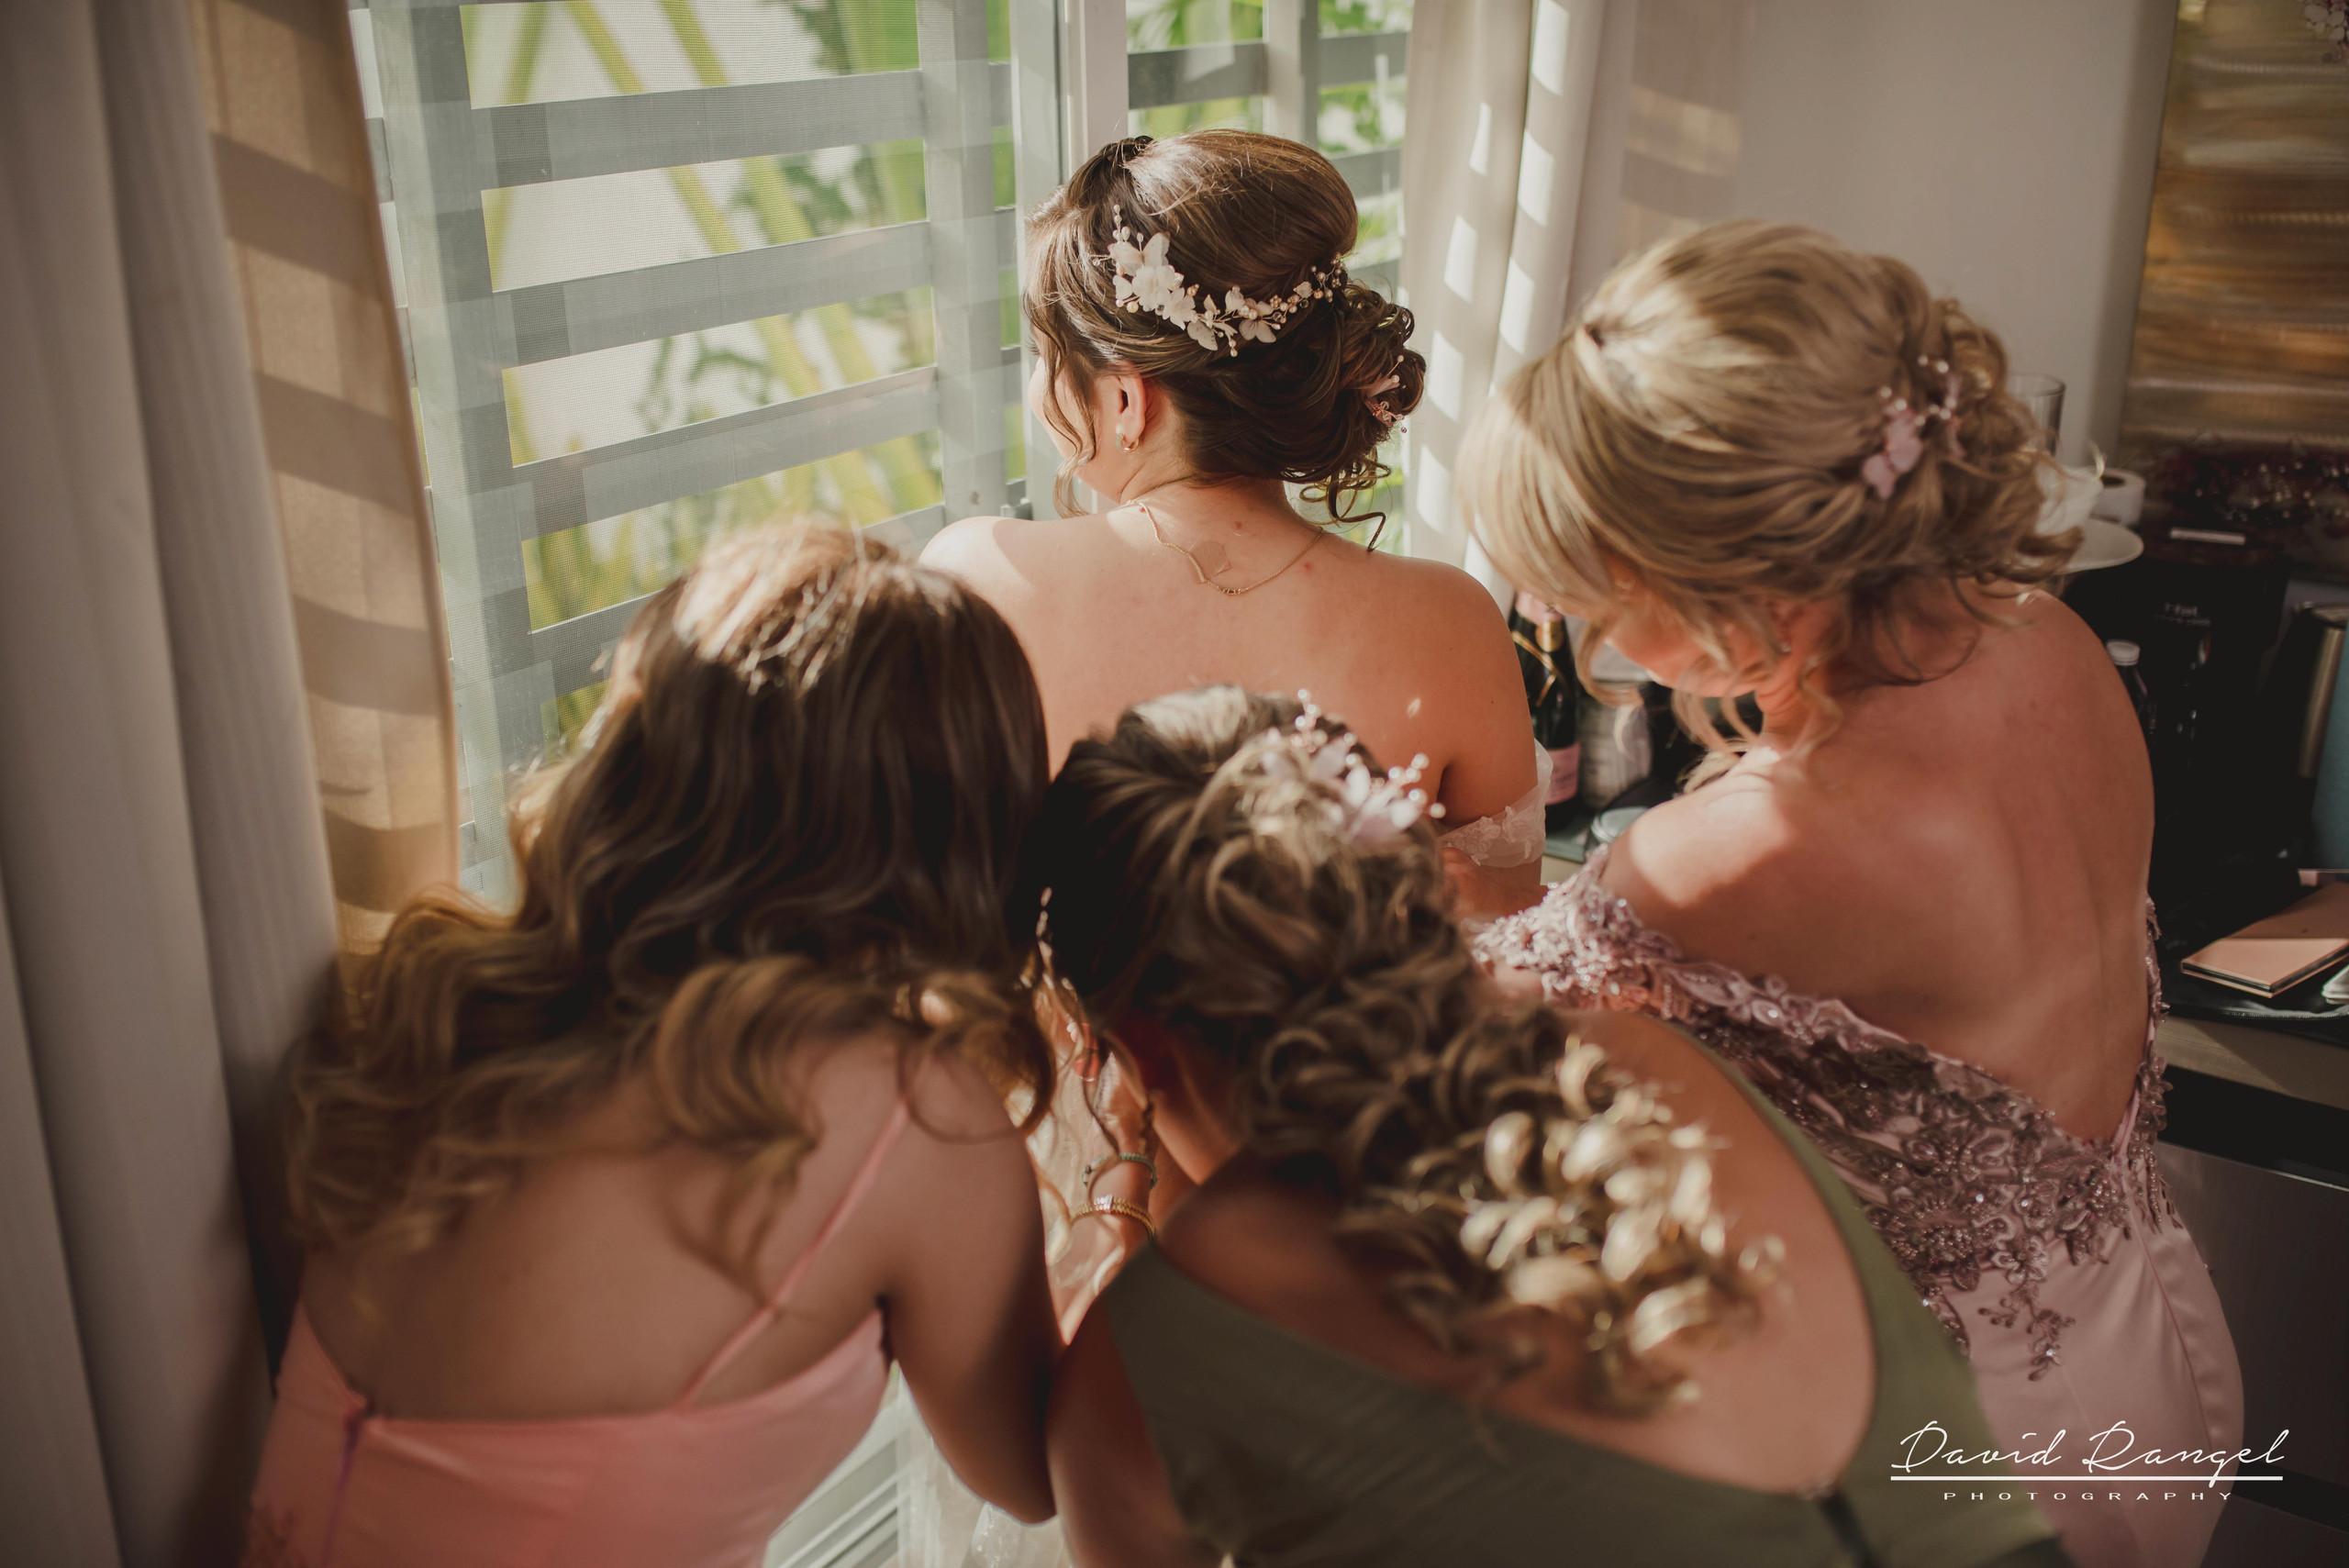 bride+getting+ready+shadow+earring++bathrobe+natural+ligh+photo+destination+wedding+isla+blanca+smile+mirror+photo+celebration+bridesmaids+mother+sister+bestfriend+closing+dress